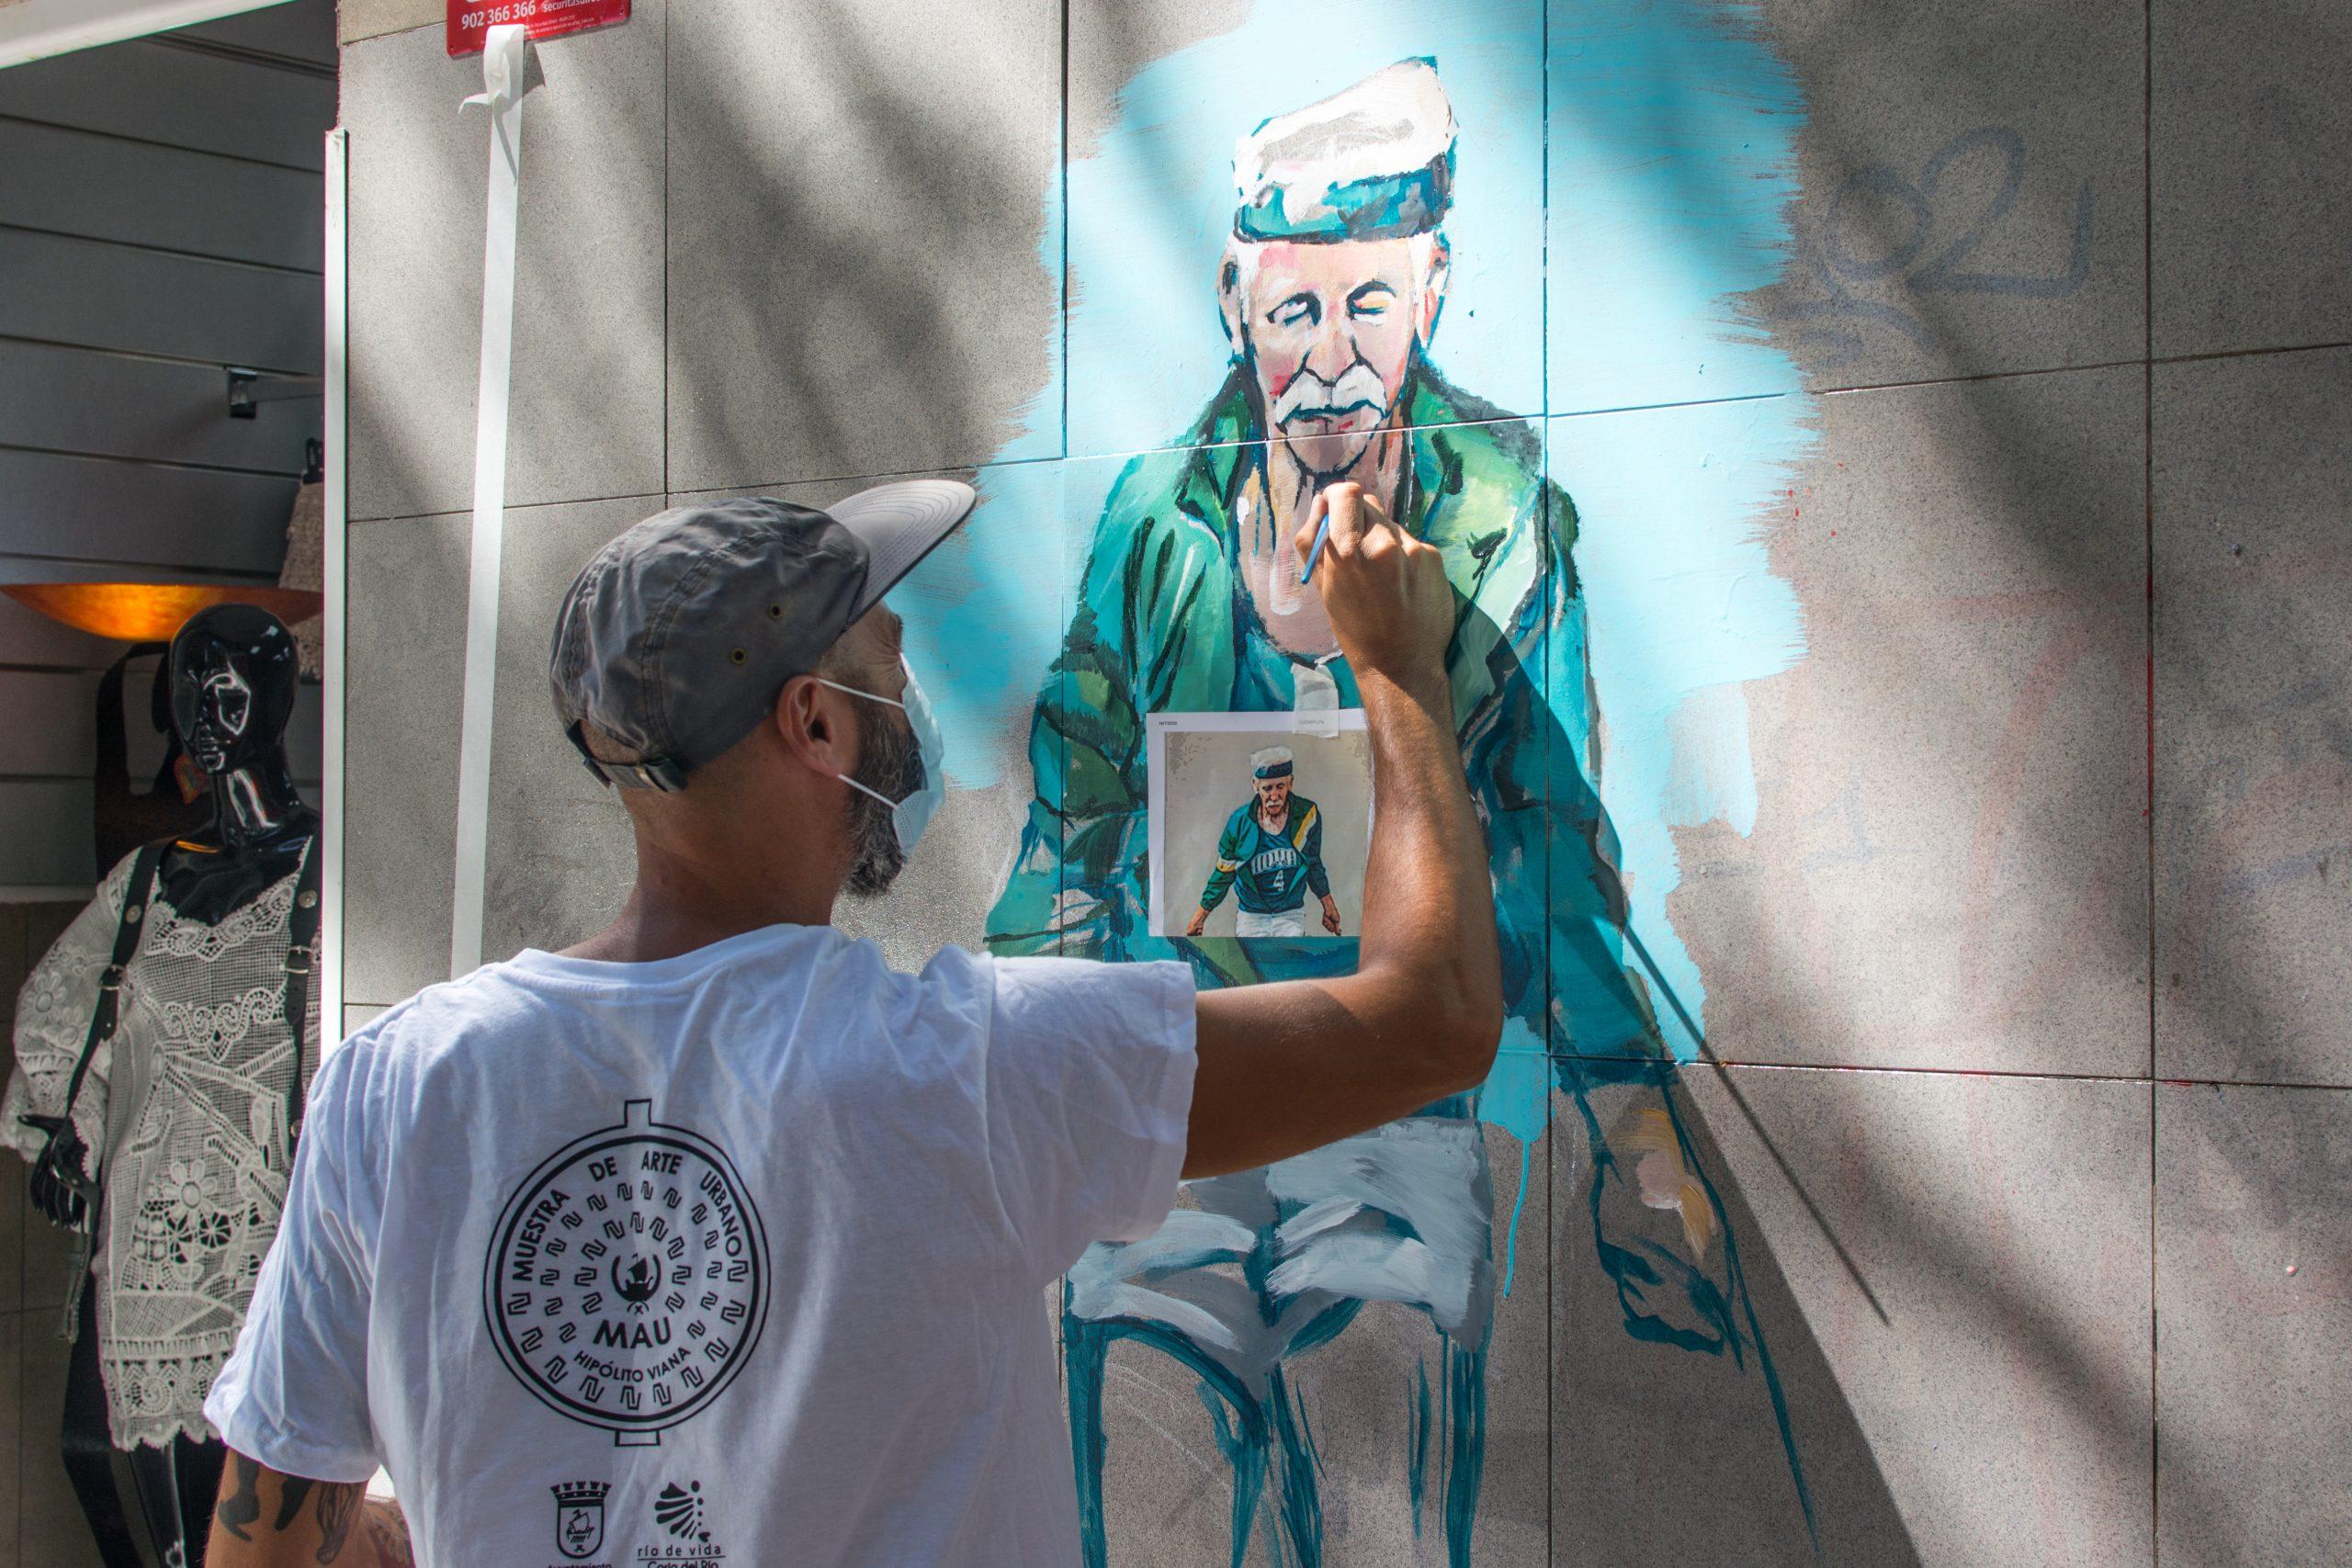 Alvaro Oskua CALLE - Guillermo de la Madrid - Madrid Street Art Project